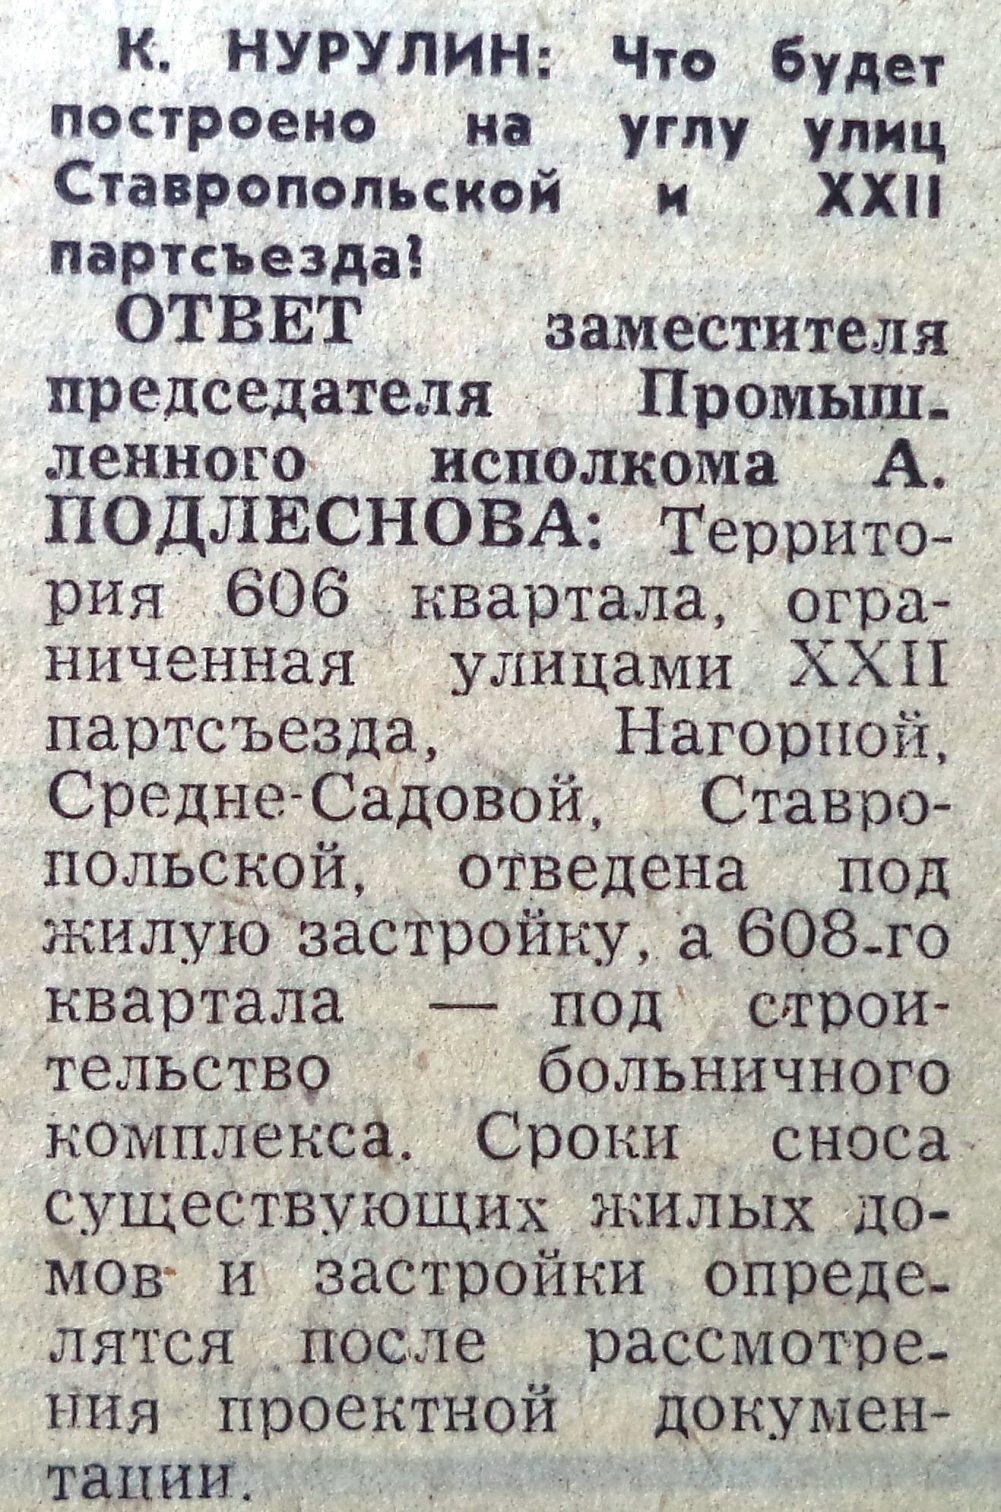 Ставропольская-ФОТО-74-ВЗя-1981-07-18-о застройке р-на XXII Парт. - Ставр.-min